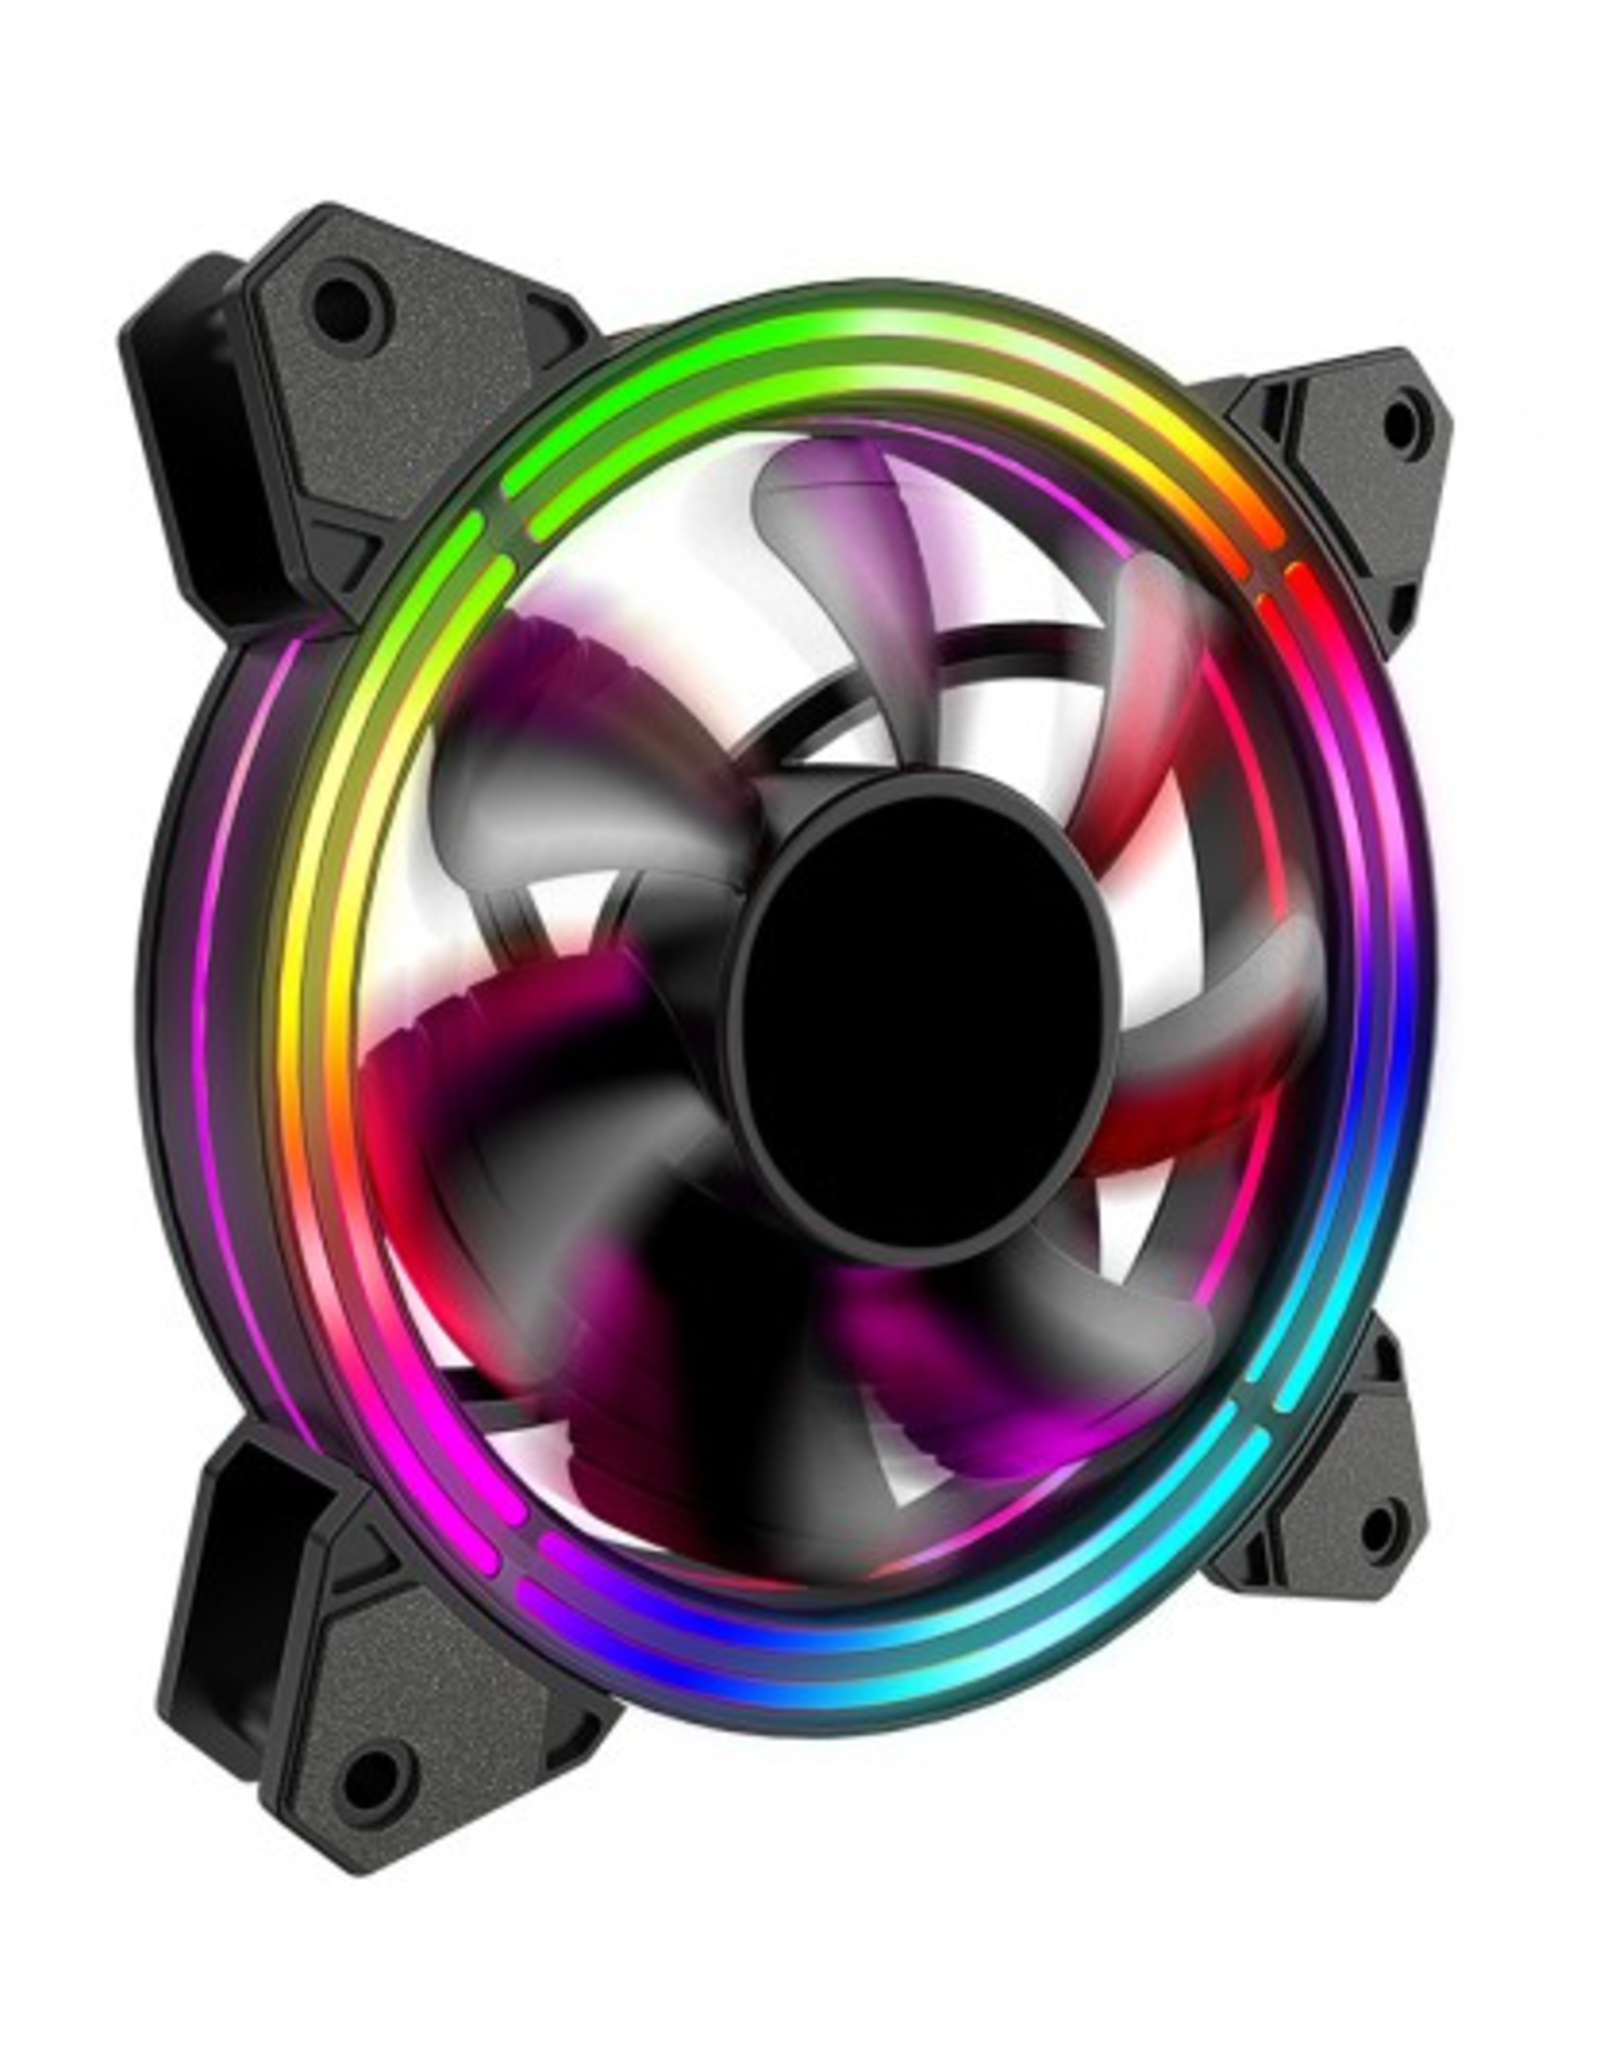 120mmX120mm (12cmX12cm) Multi-color LED Light Fan (Case)